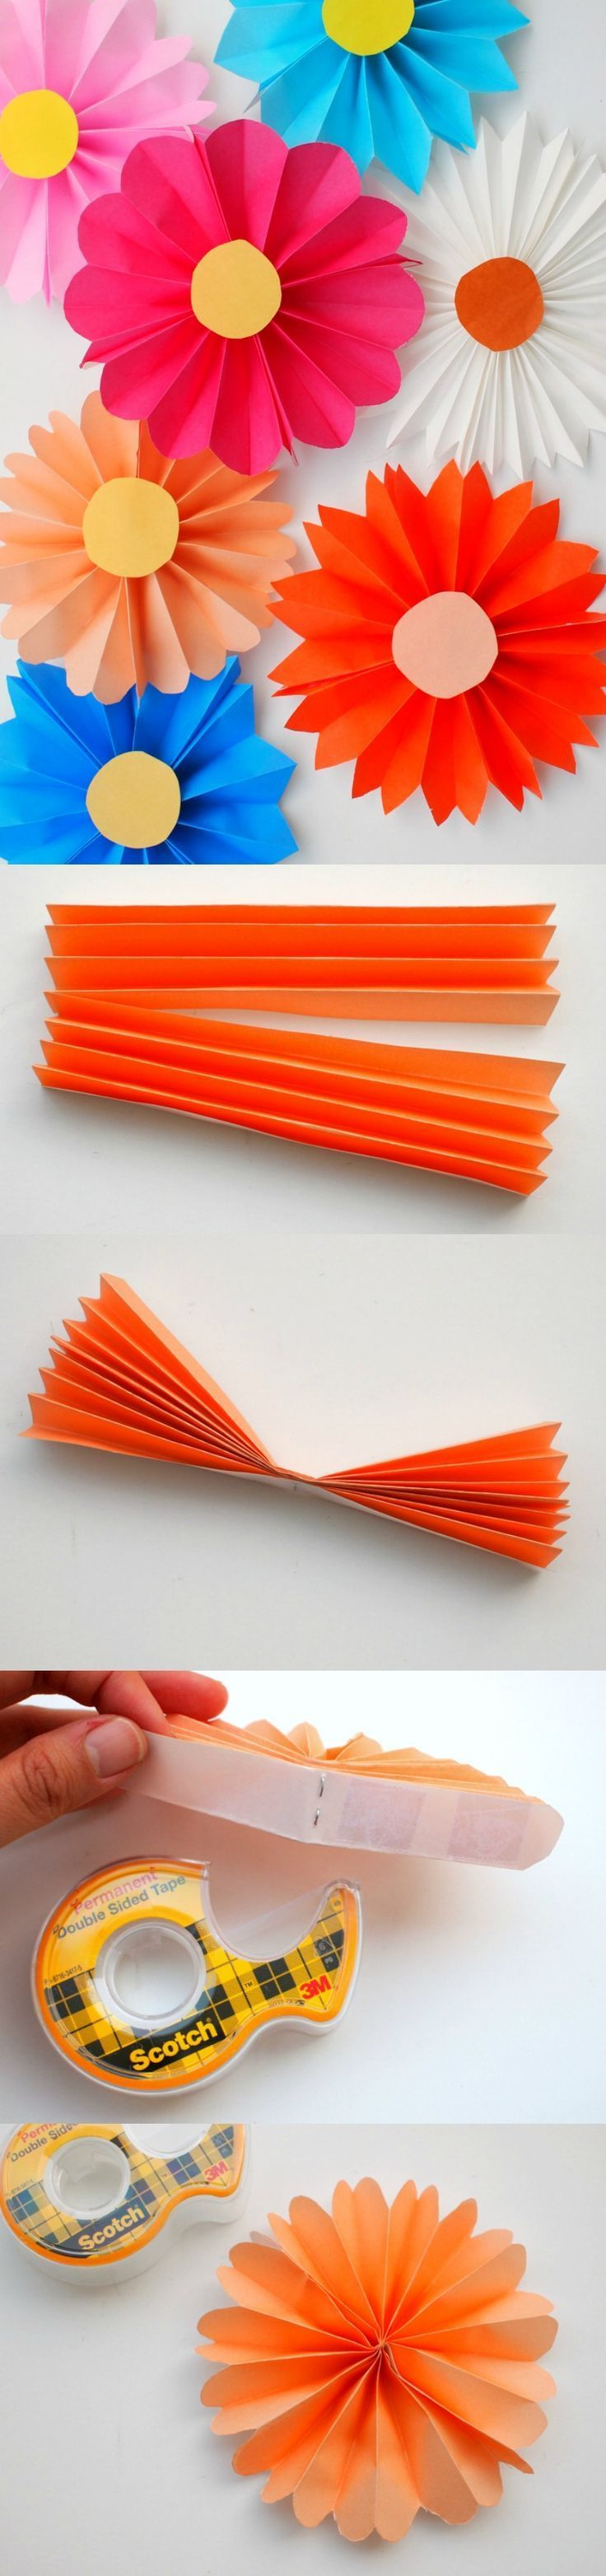 Accordion Paper Flowers 324 best Paper Crafts